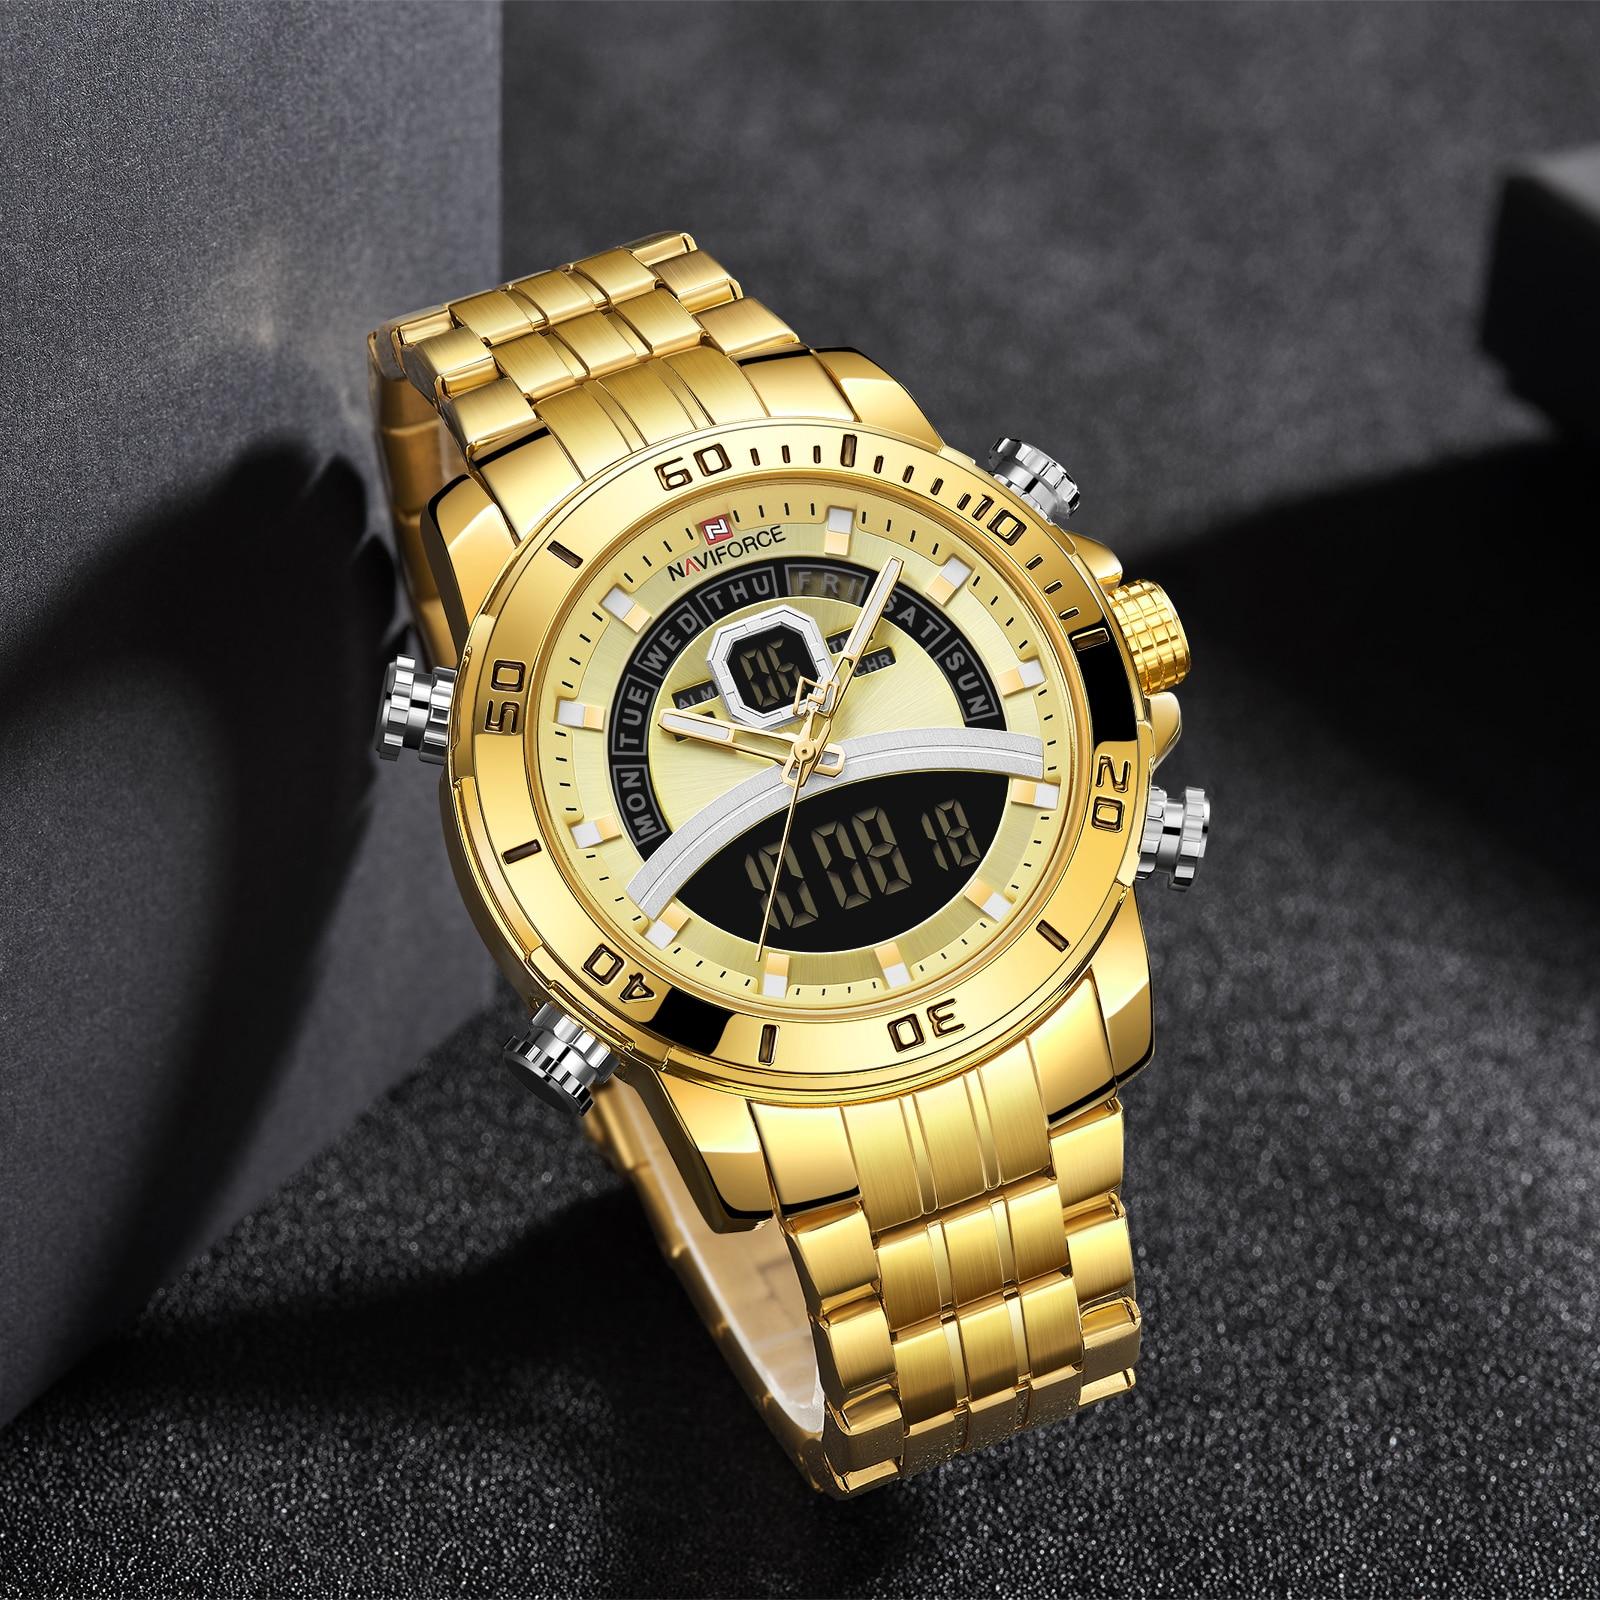 NAVIFORCE-ساعة رجالية ذهبية ، ساعة رياضية عصرية من الفولاذ المقاوم للصدأ ، ساعة توقيت ، كرونوغراف رقمي ، مقاومة للماء